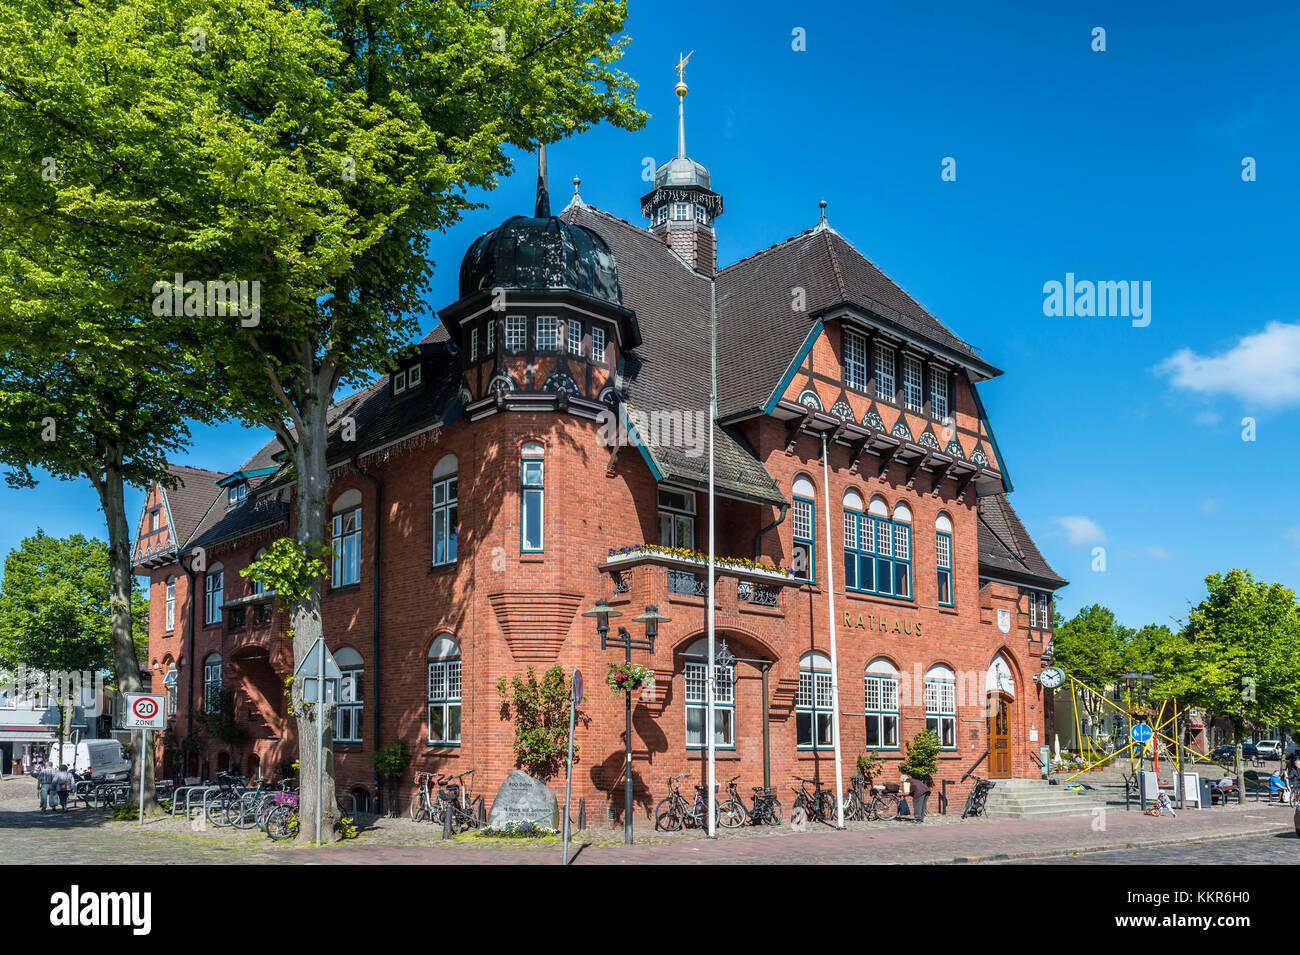 Burg on Fehmarn, island of Fehmarn, Schleswig-Holstein, Germany, city hall on the marketplace of Burg on Fehmarn - Stock Image